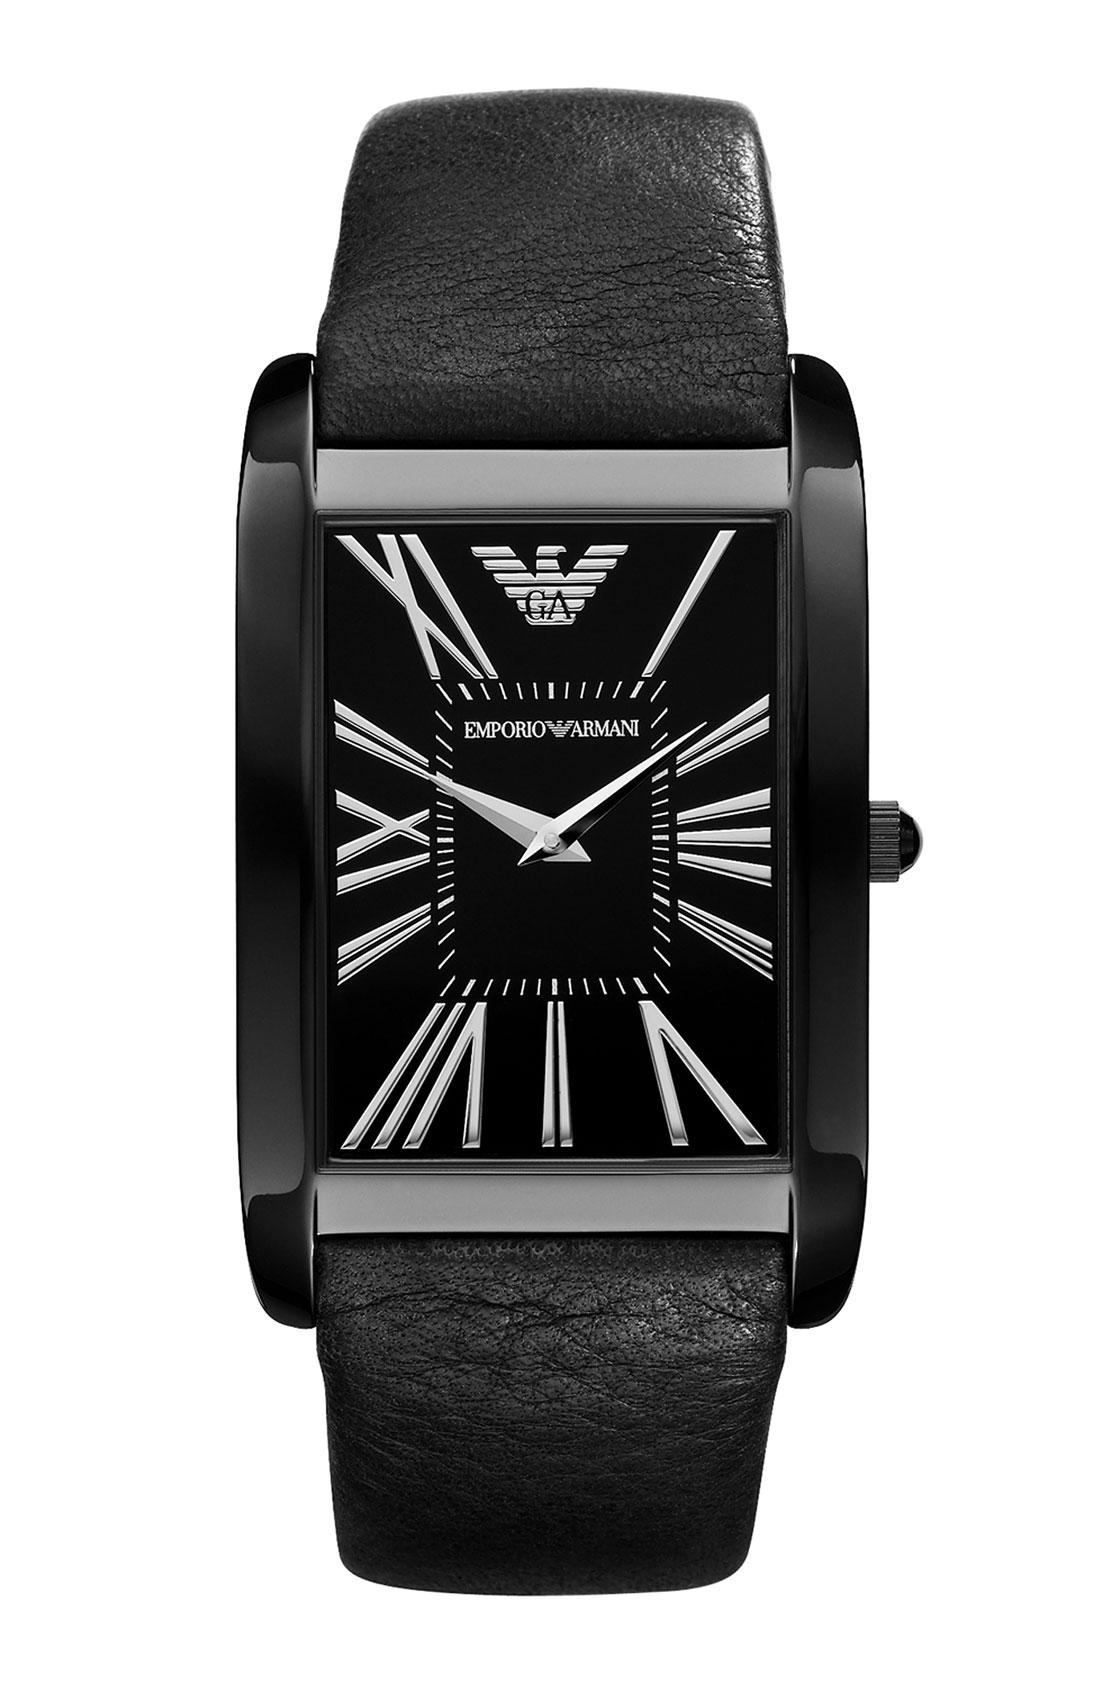 Emporio Armani Large Rectangular Watch In Black For Men